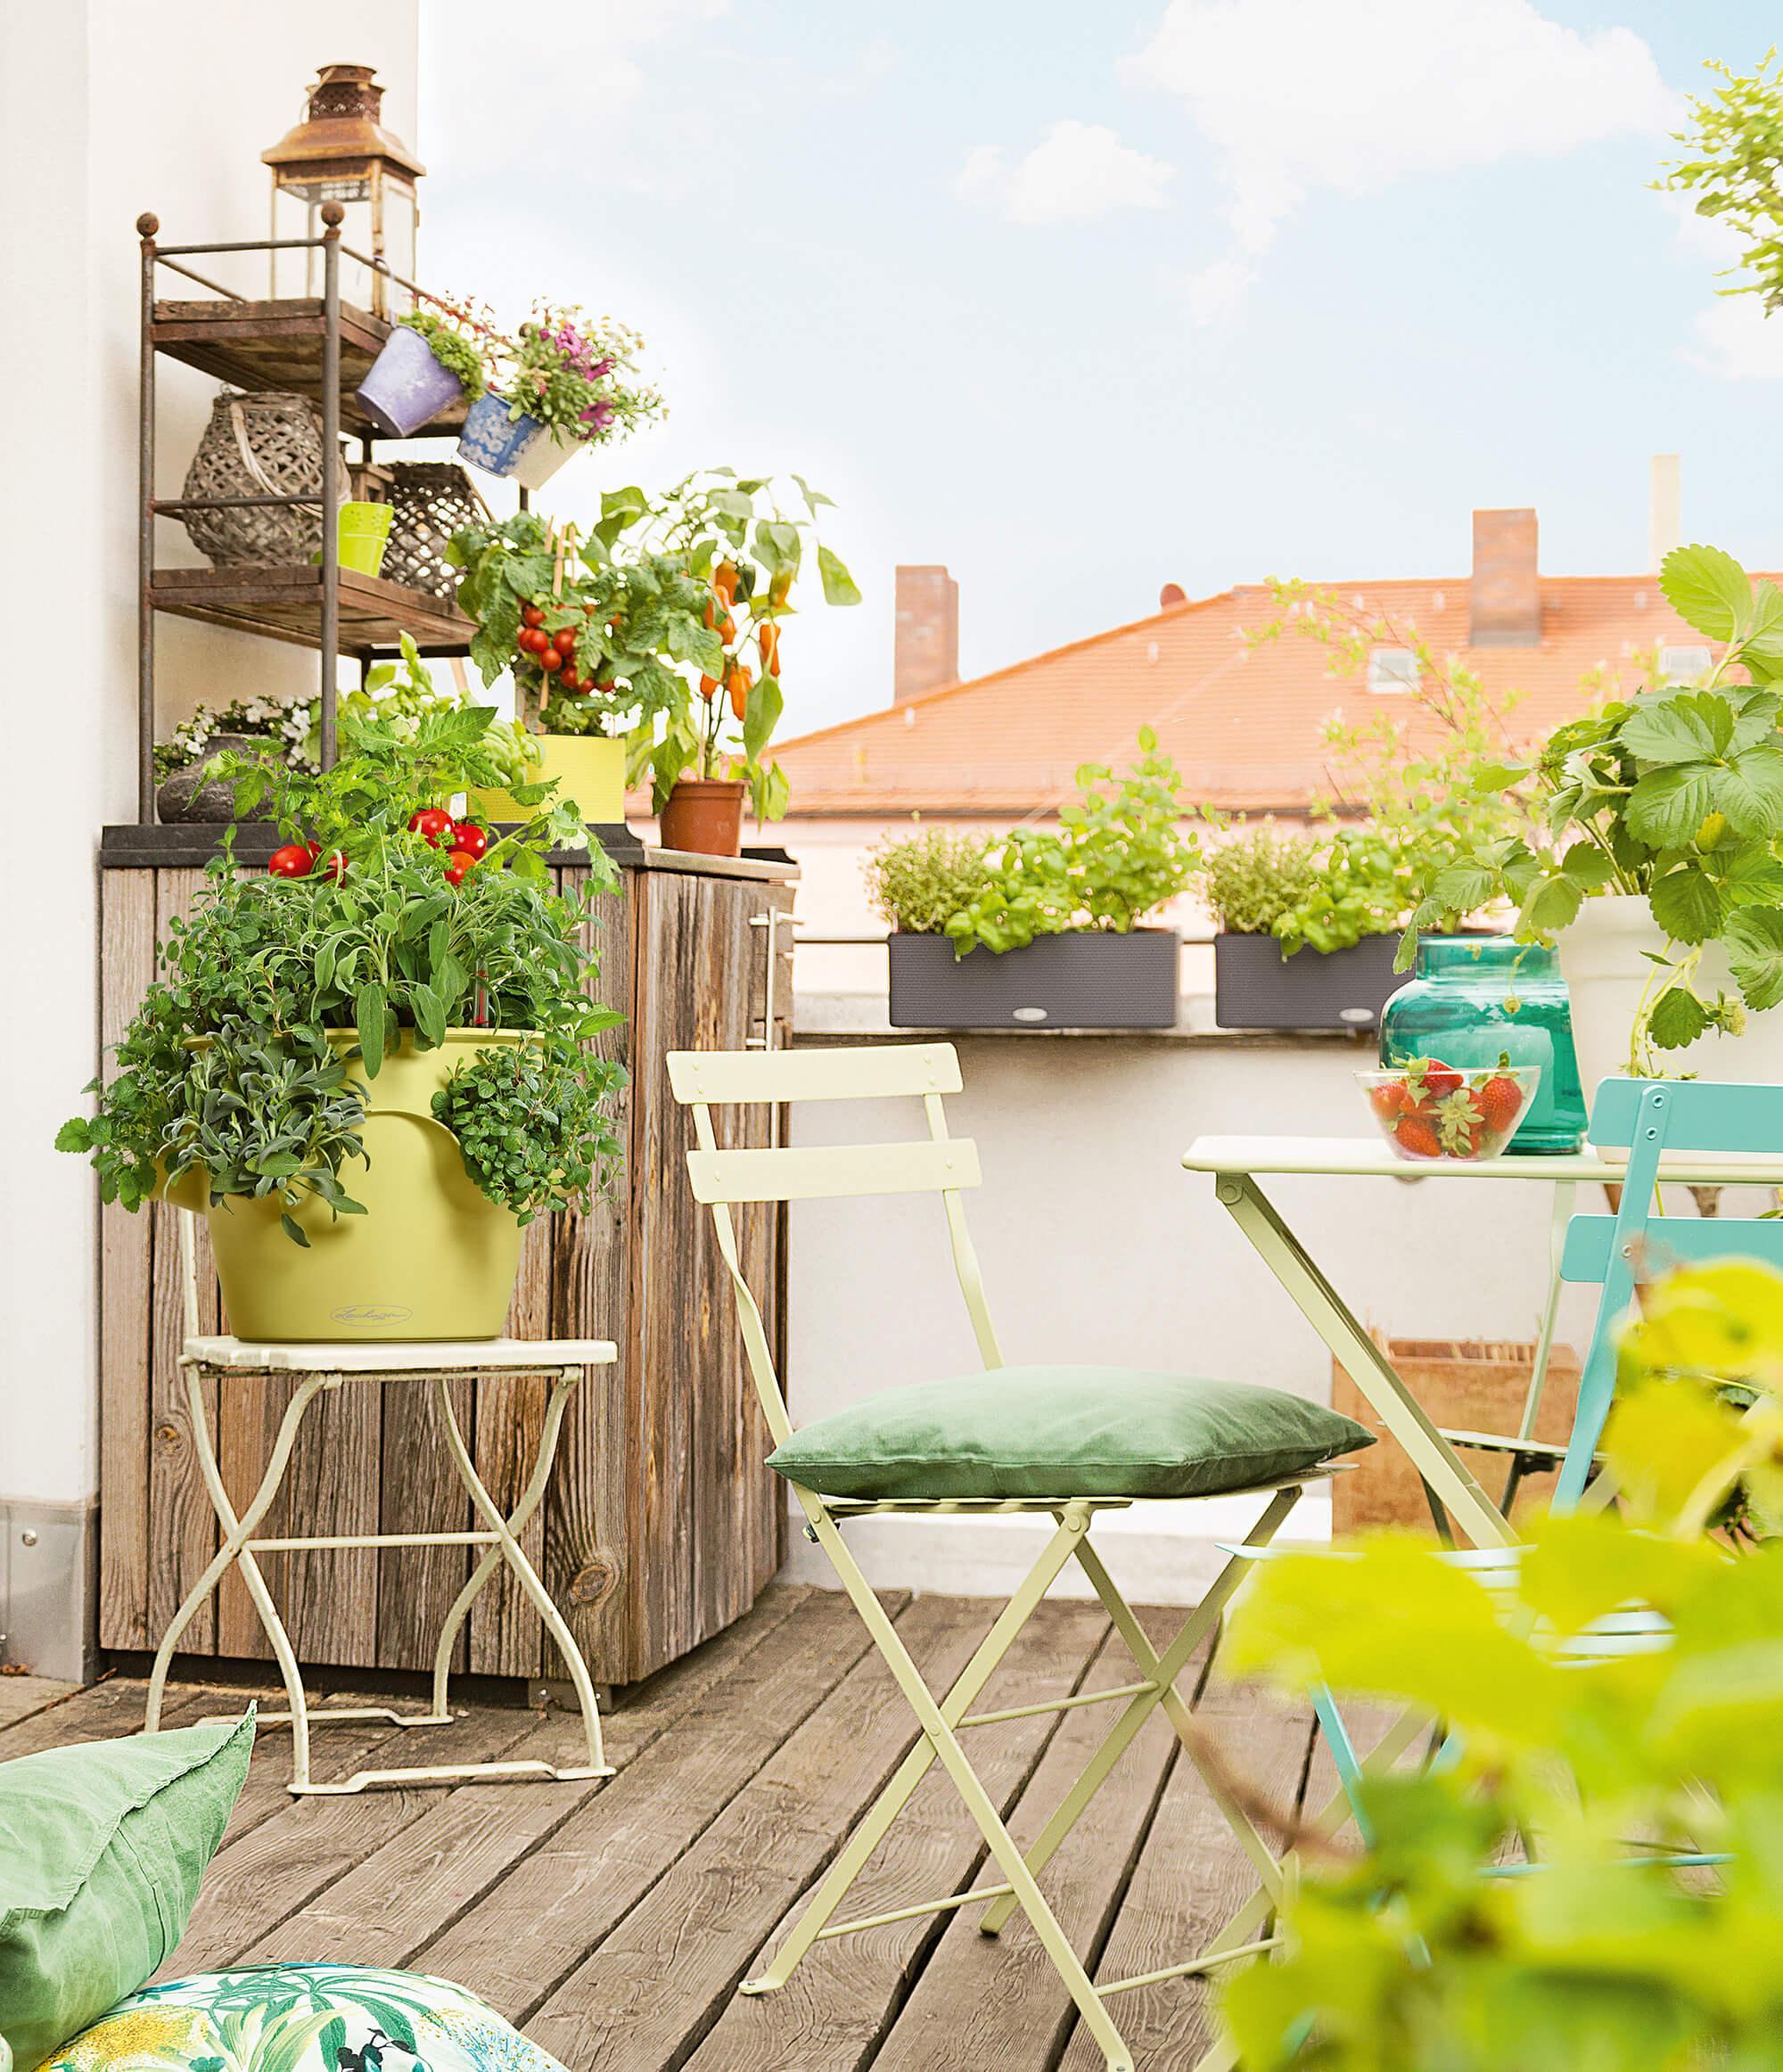 le_tw-urban-gardening_cascadino_gruen